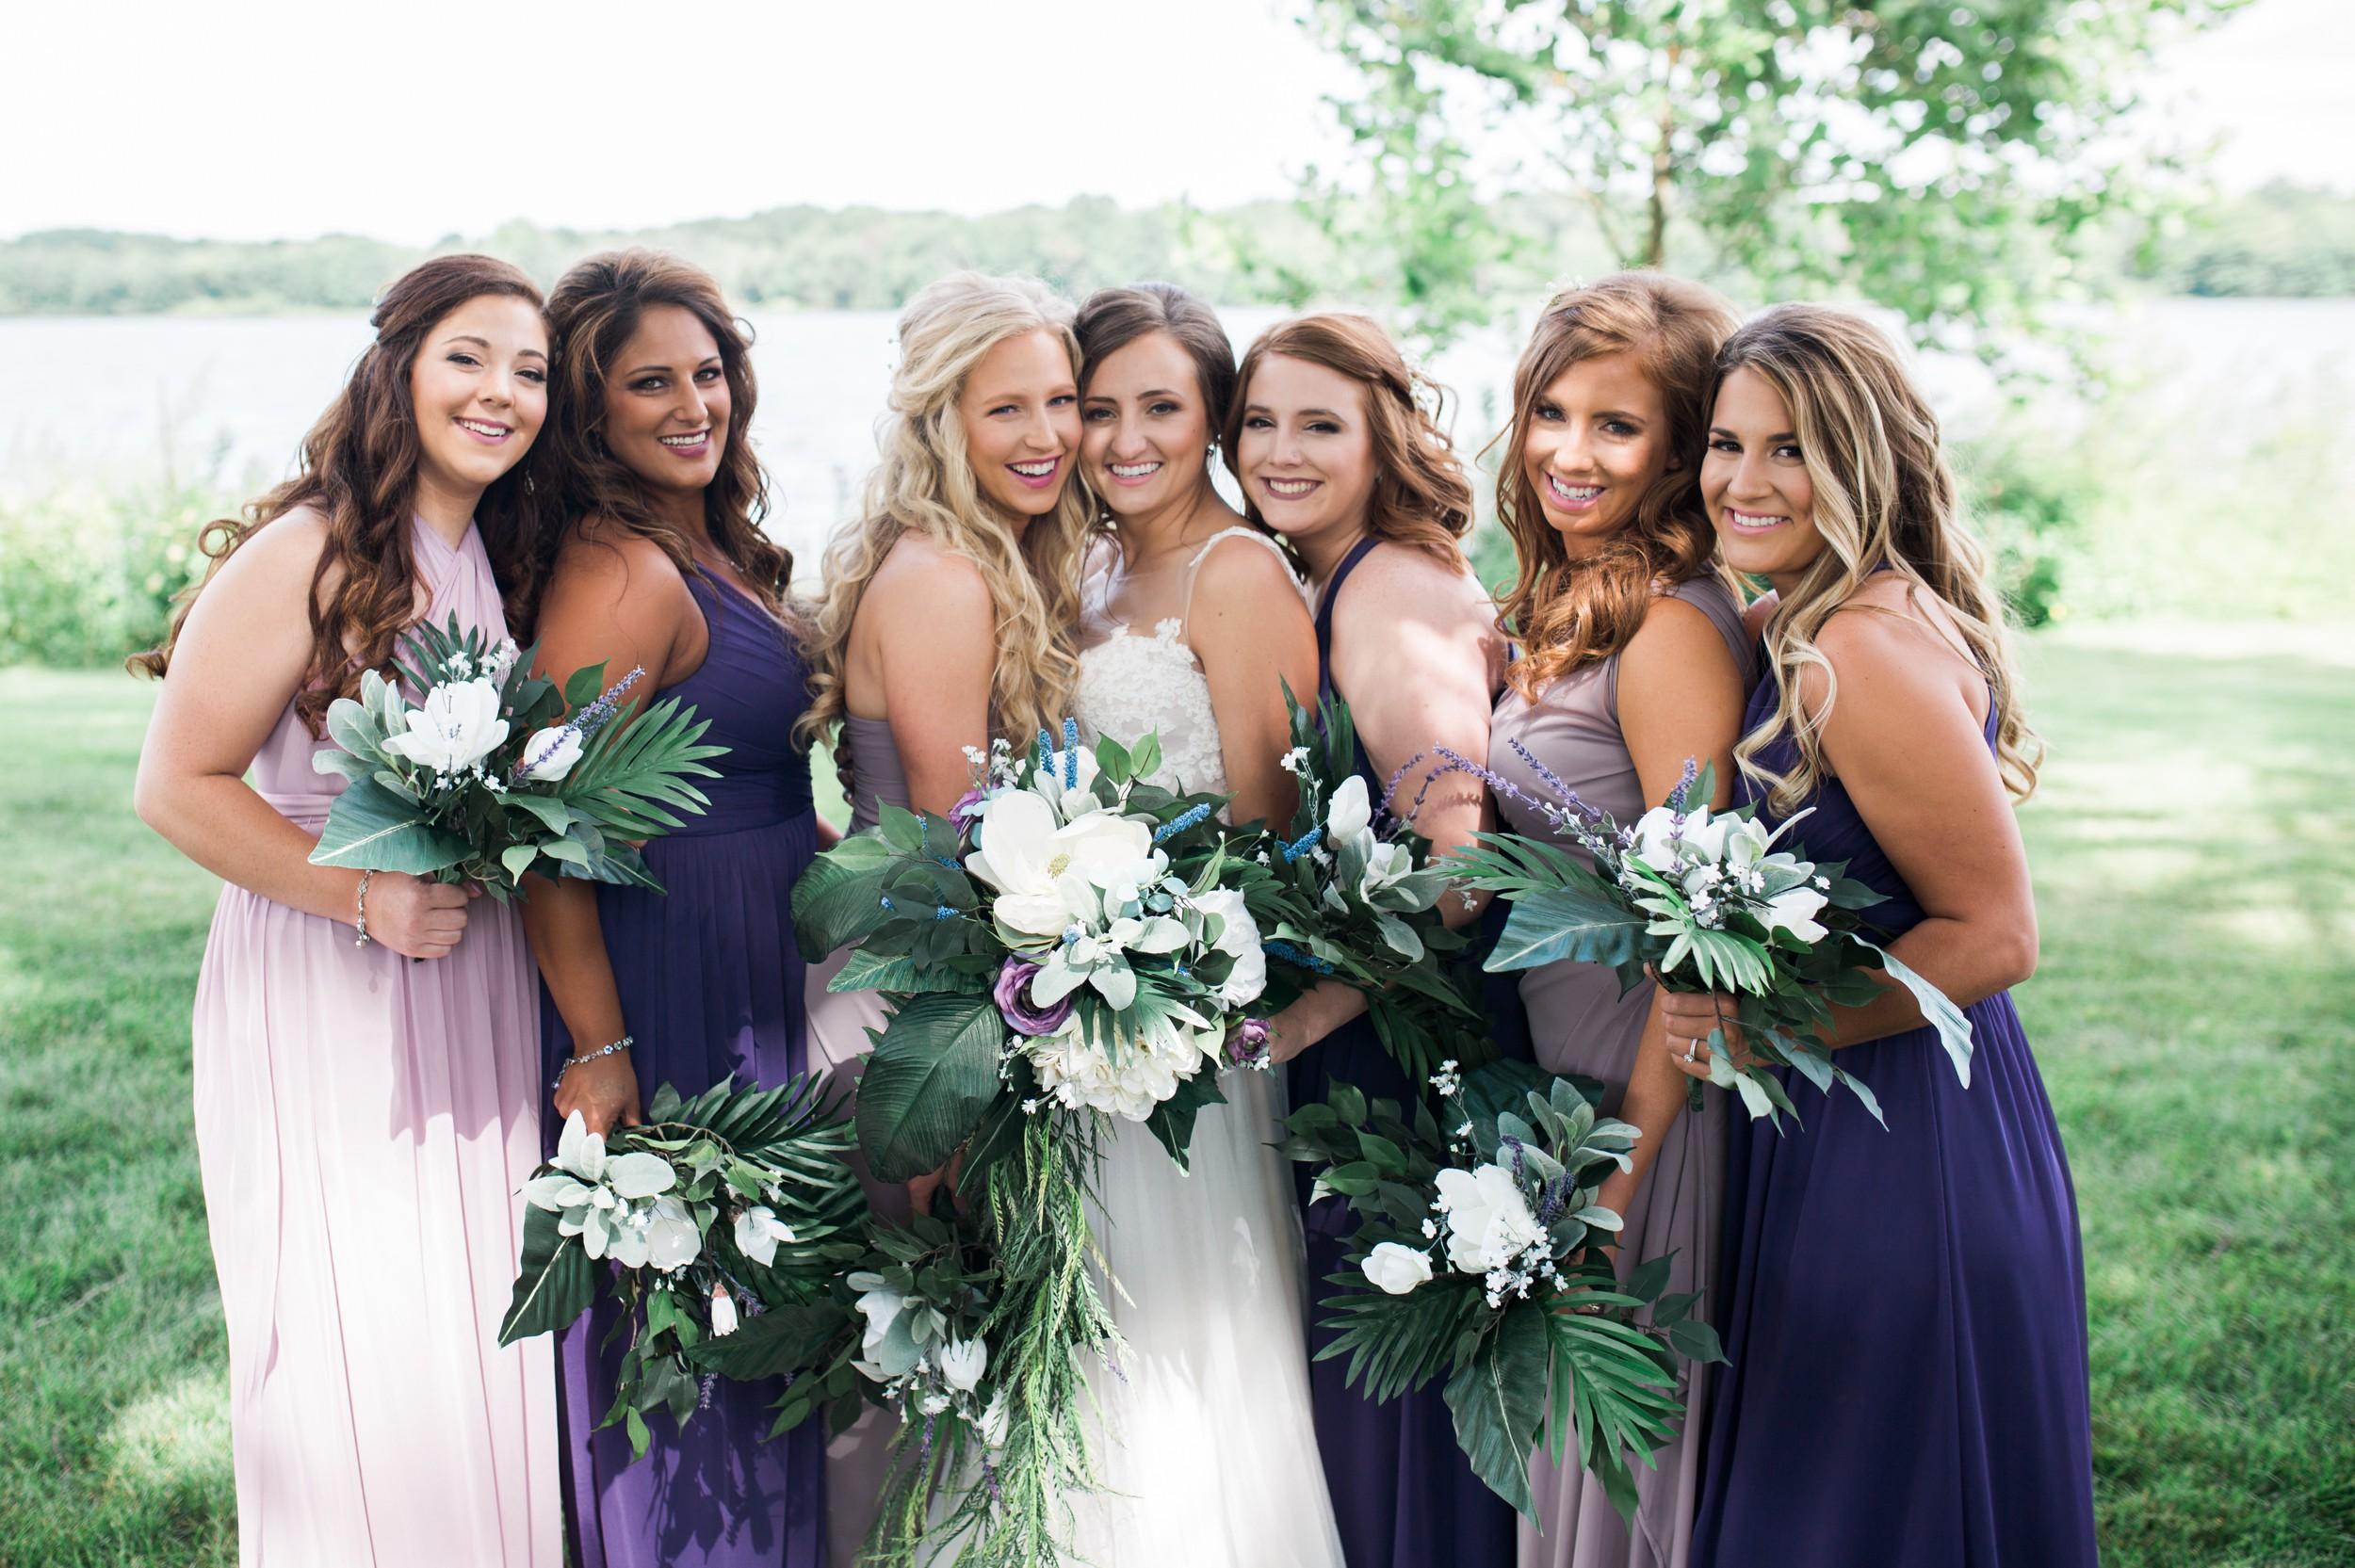 Nick-and-martina-pinelake-vinyards-wedding-columbiana-ohio-tracylynn-photography 19.jpg